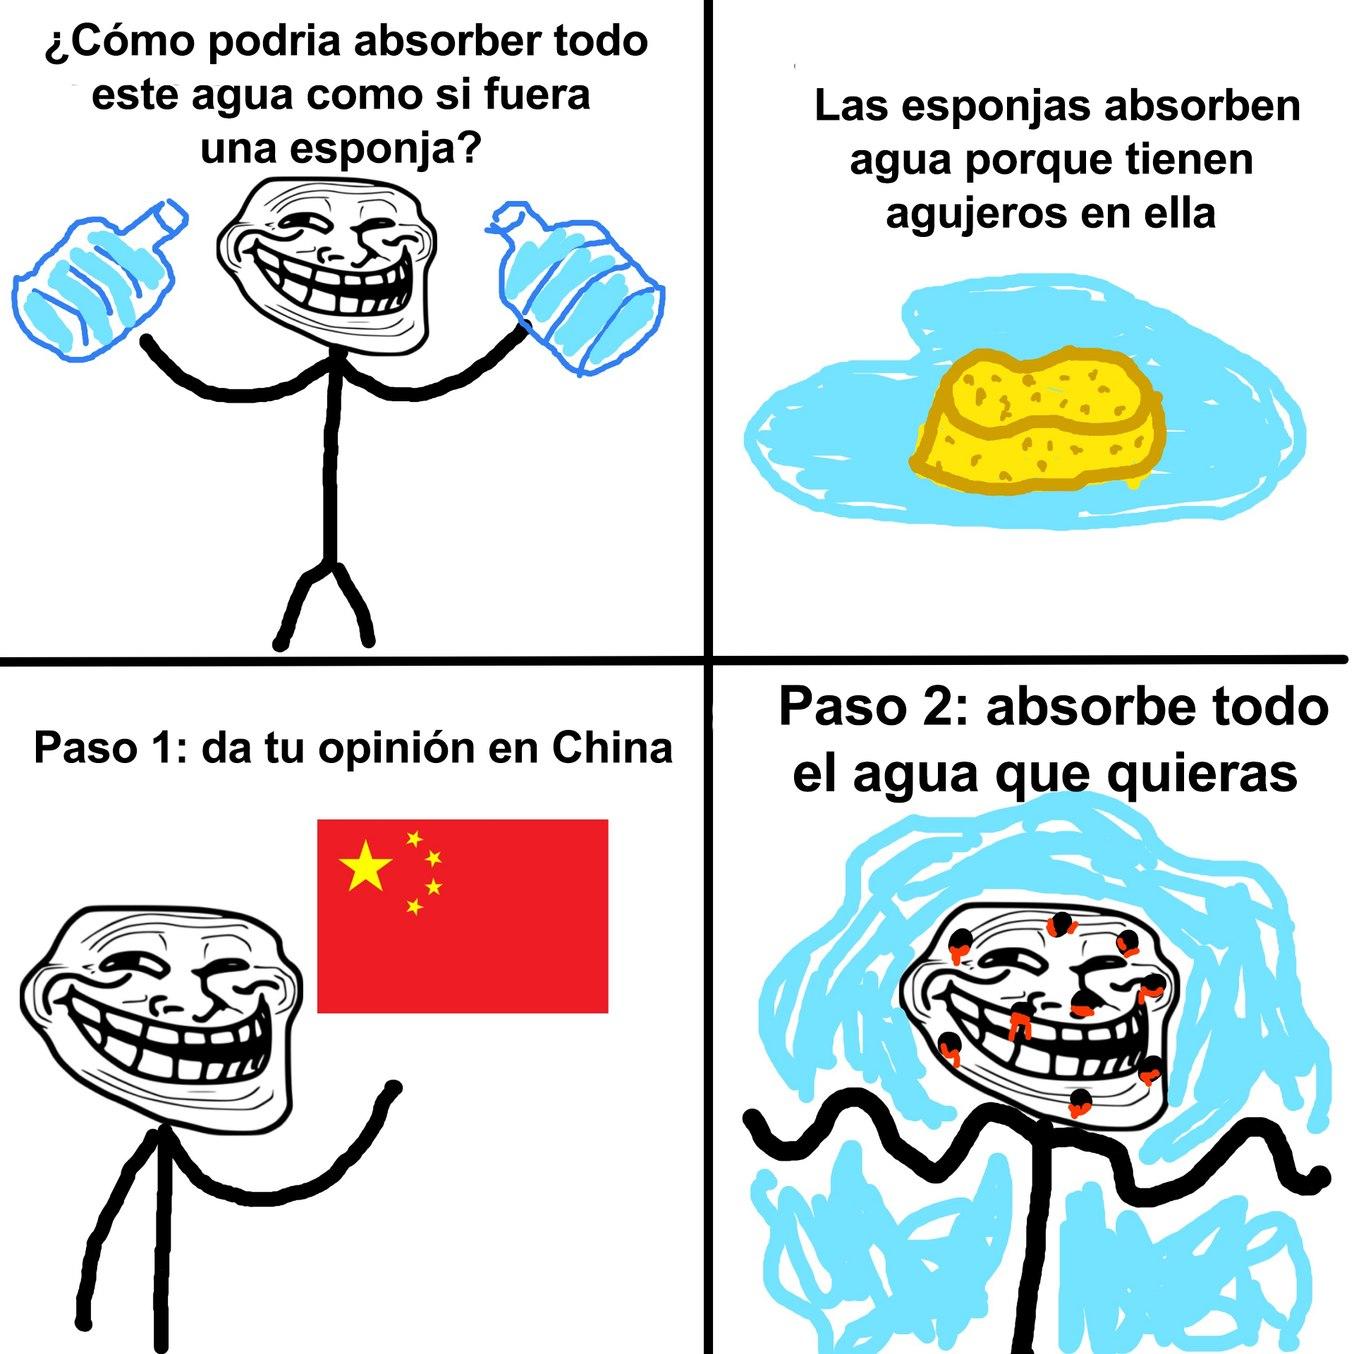 [Titulo censurado por orden del PCCh] - meme